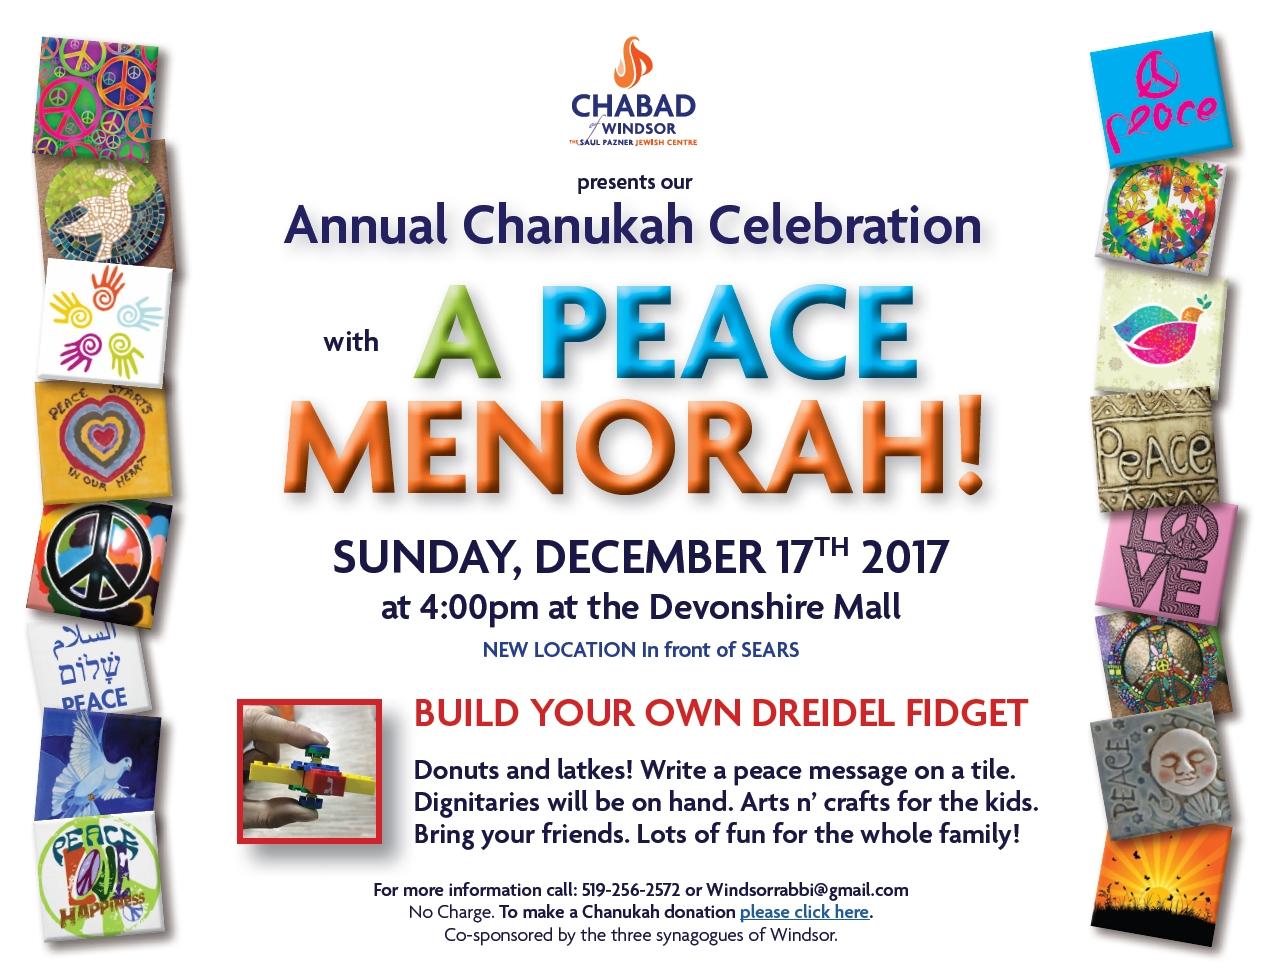 Come light the Peace Menorah